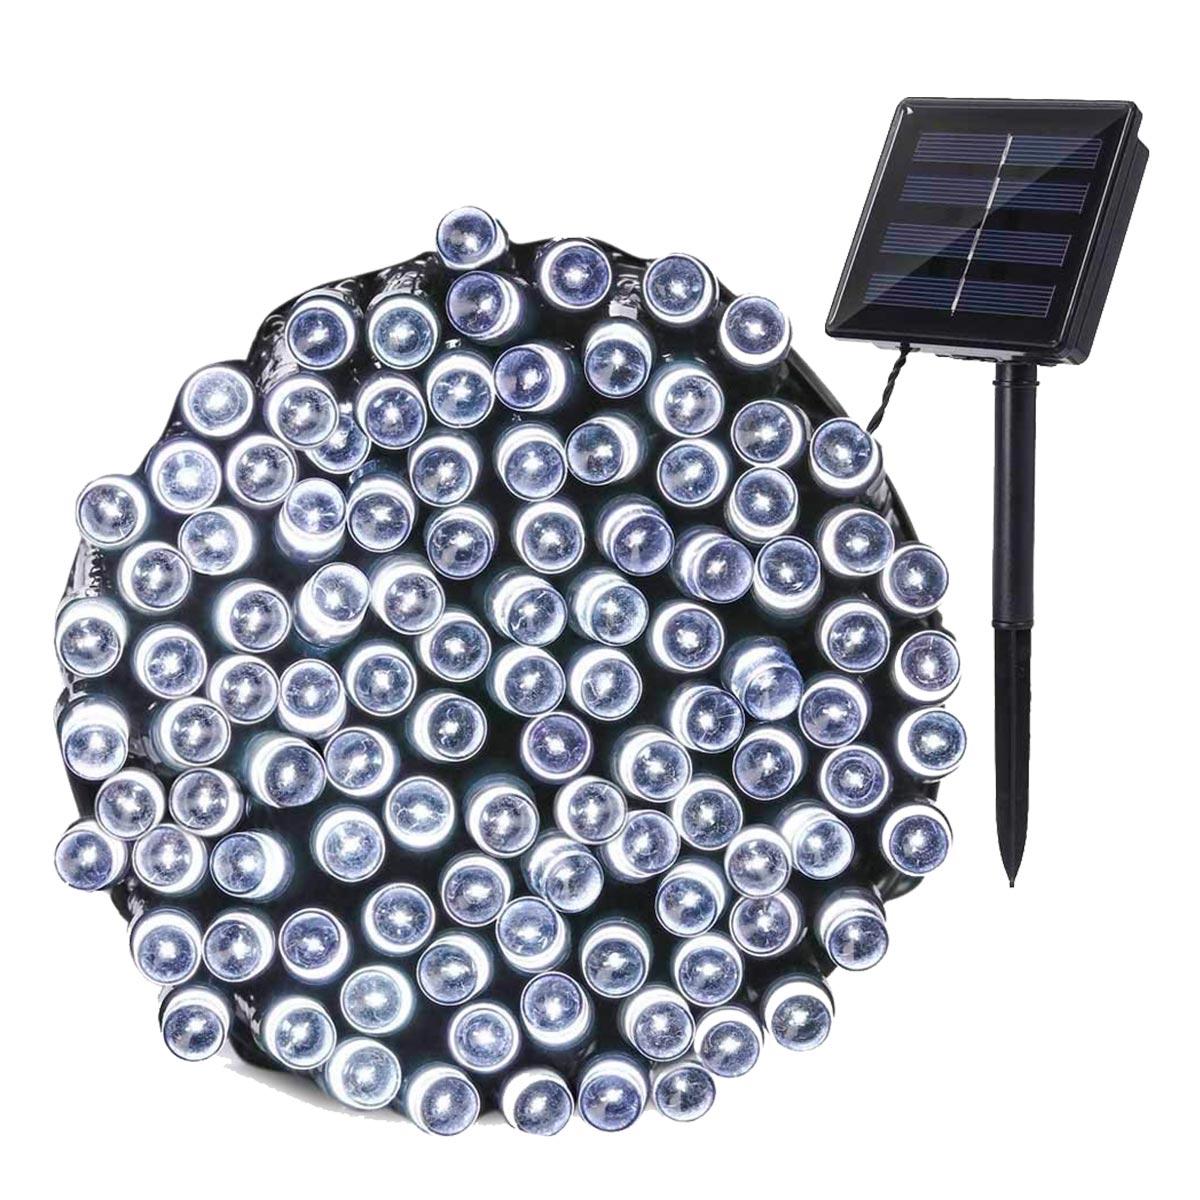 Guirlande lumineuse solaire L16m